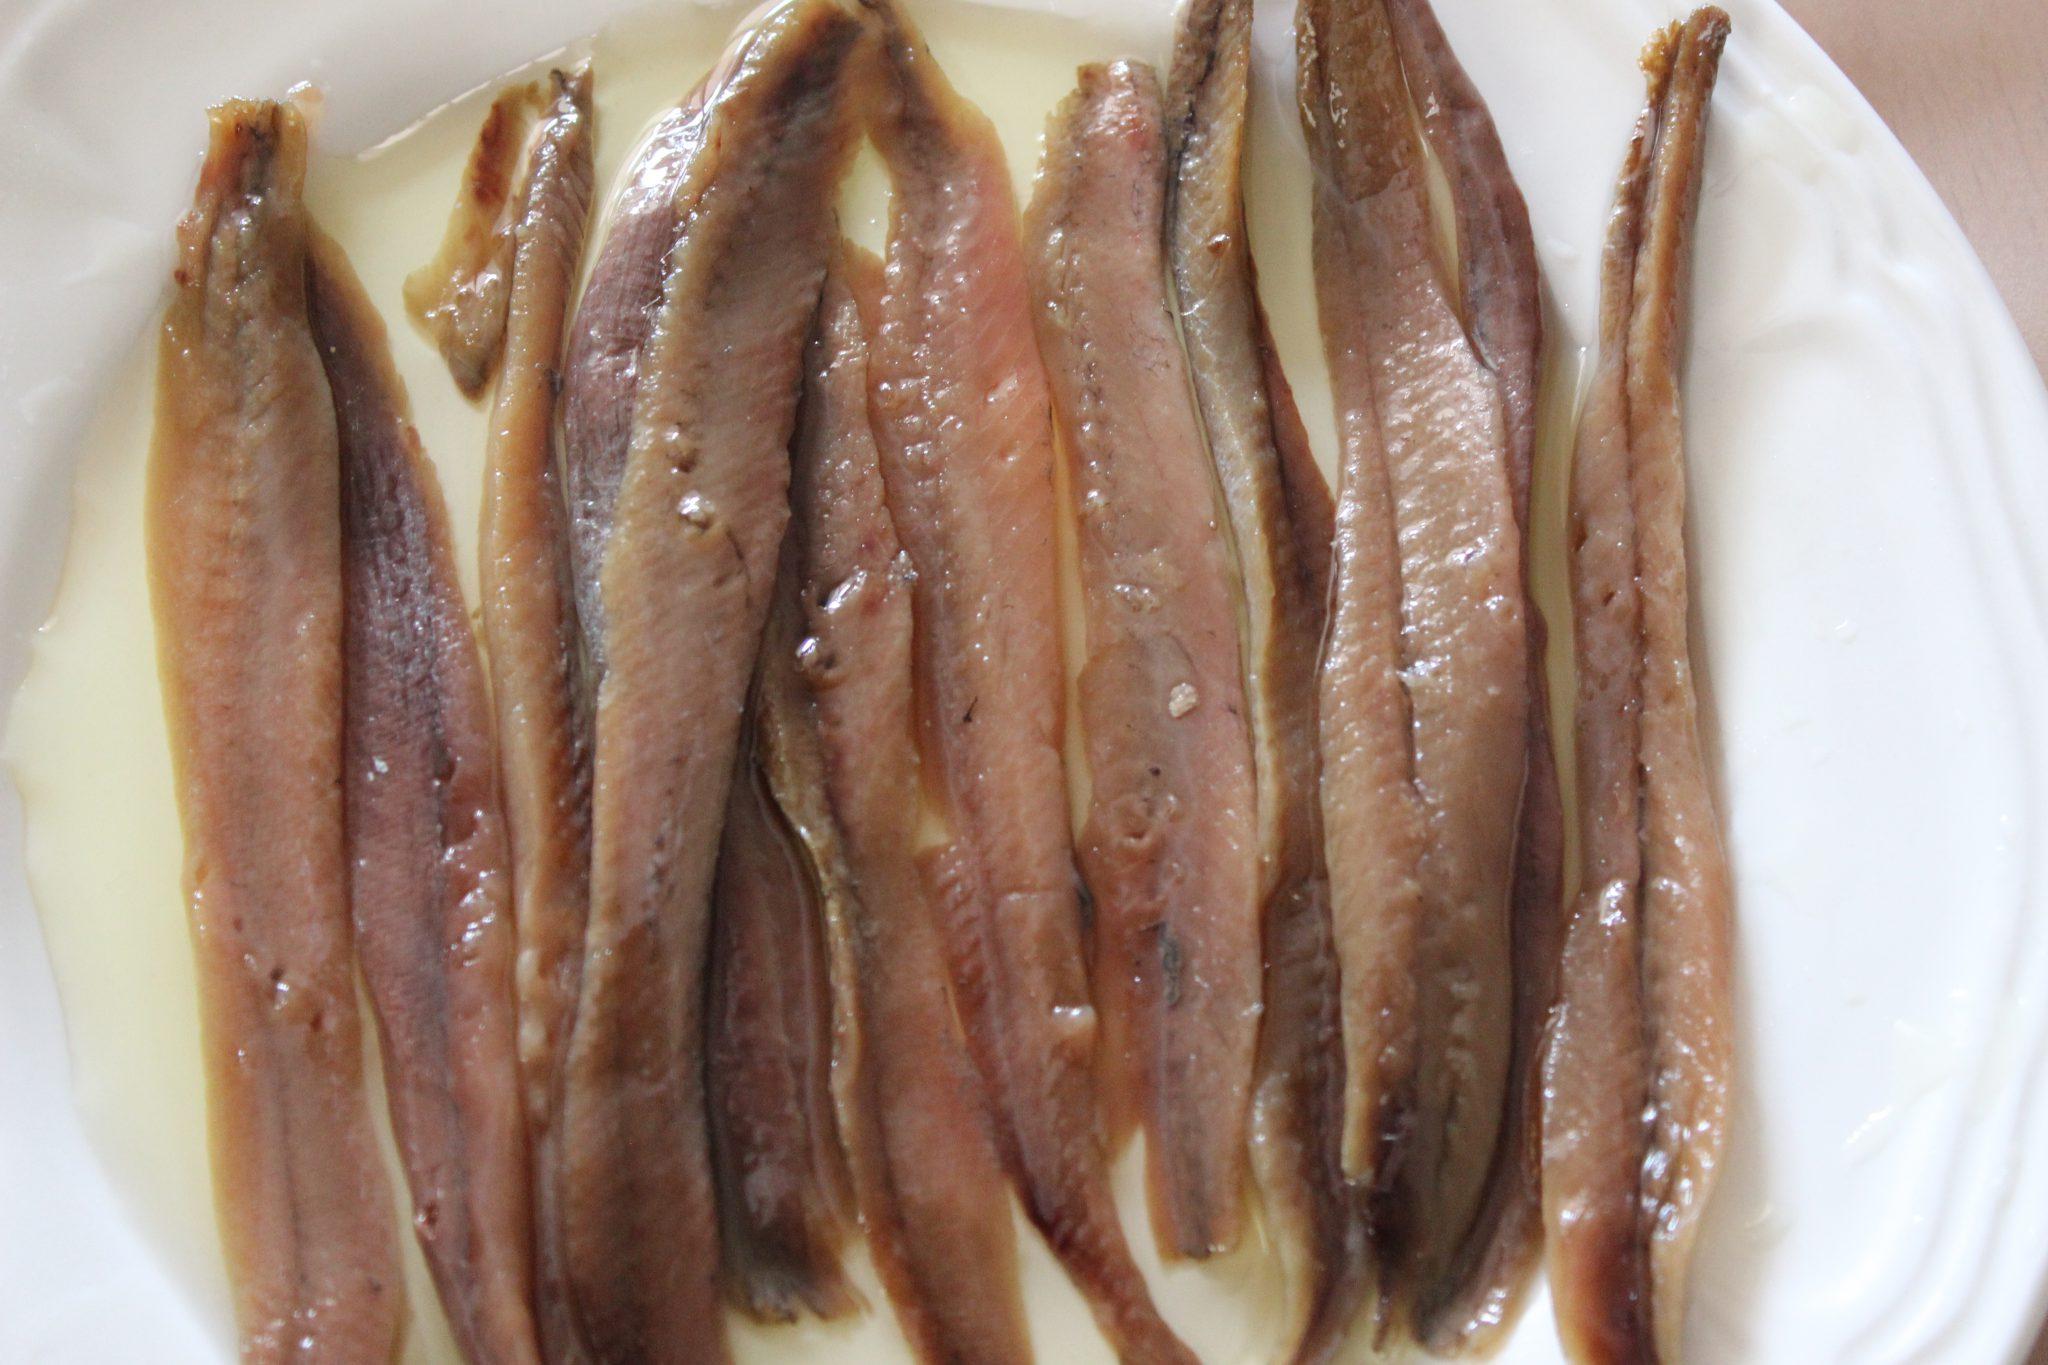 Comprar autenticas anchoas de costera en conserva